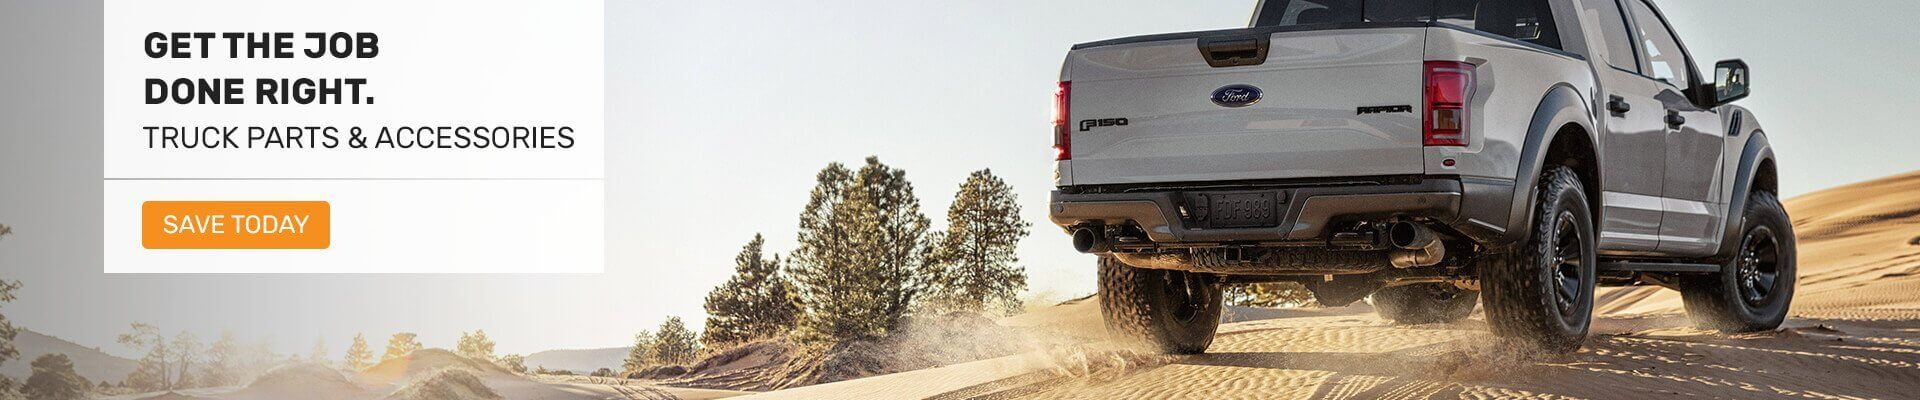 Genuine Ford Truck Parts & Accessories